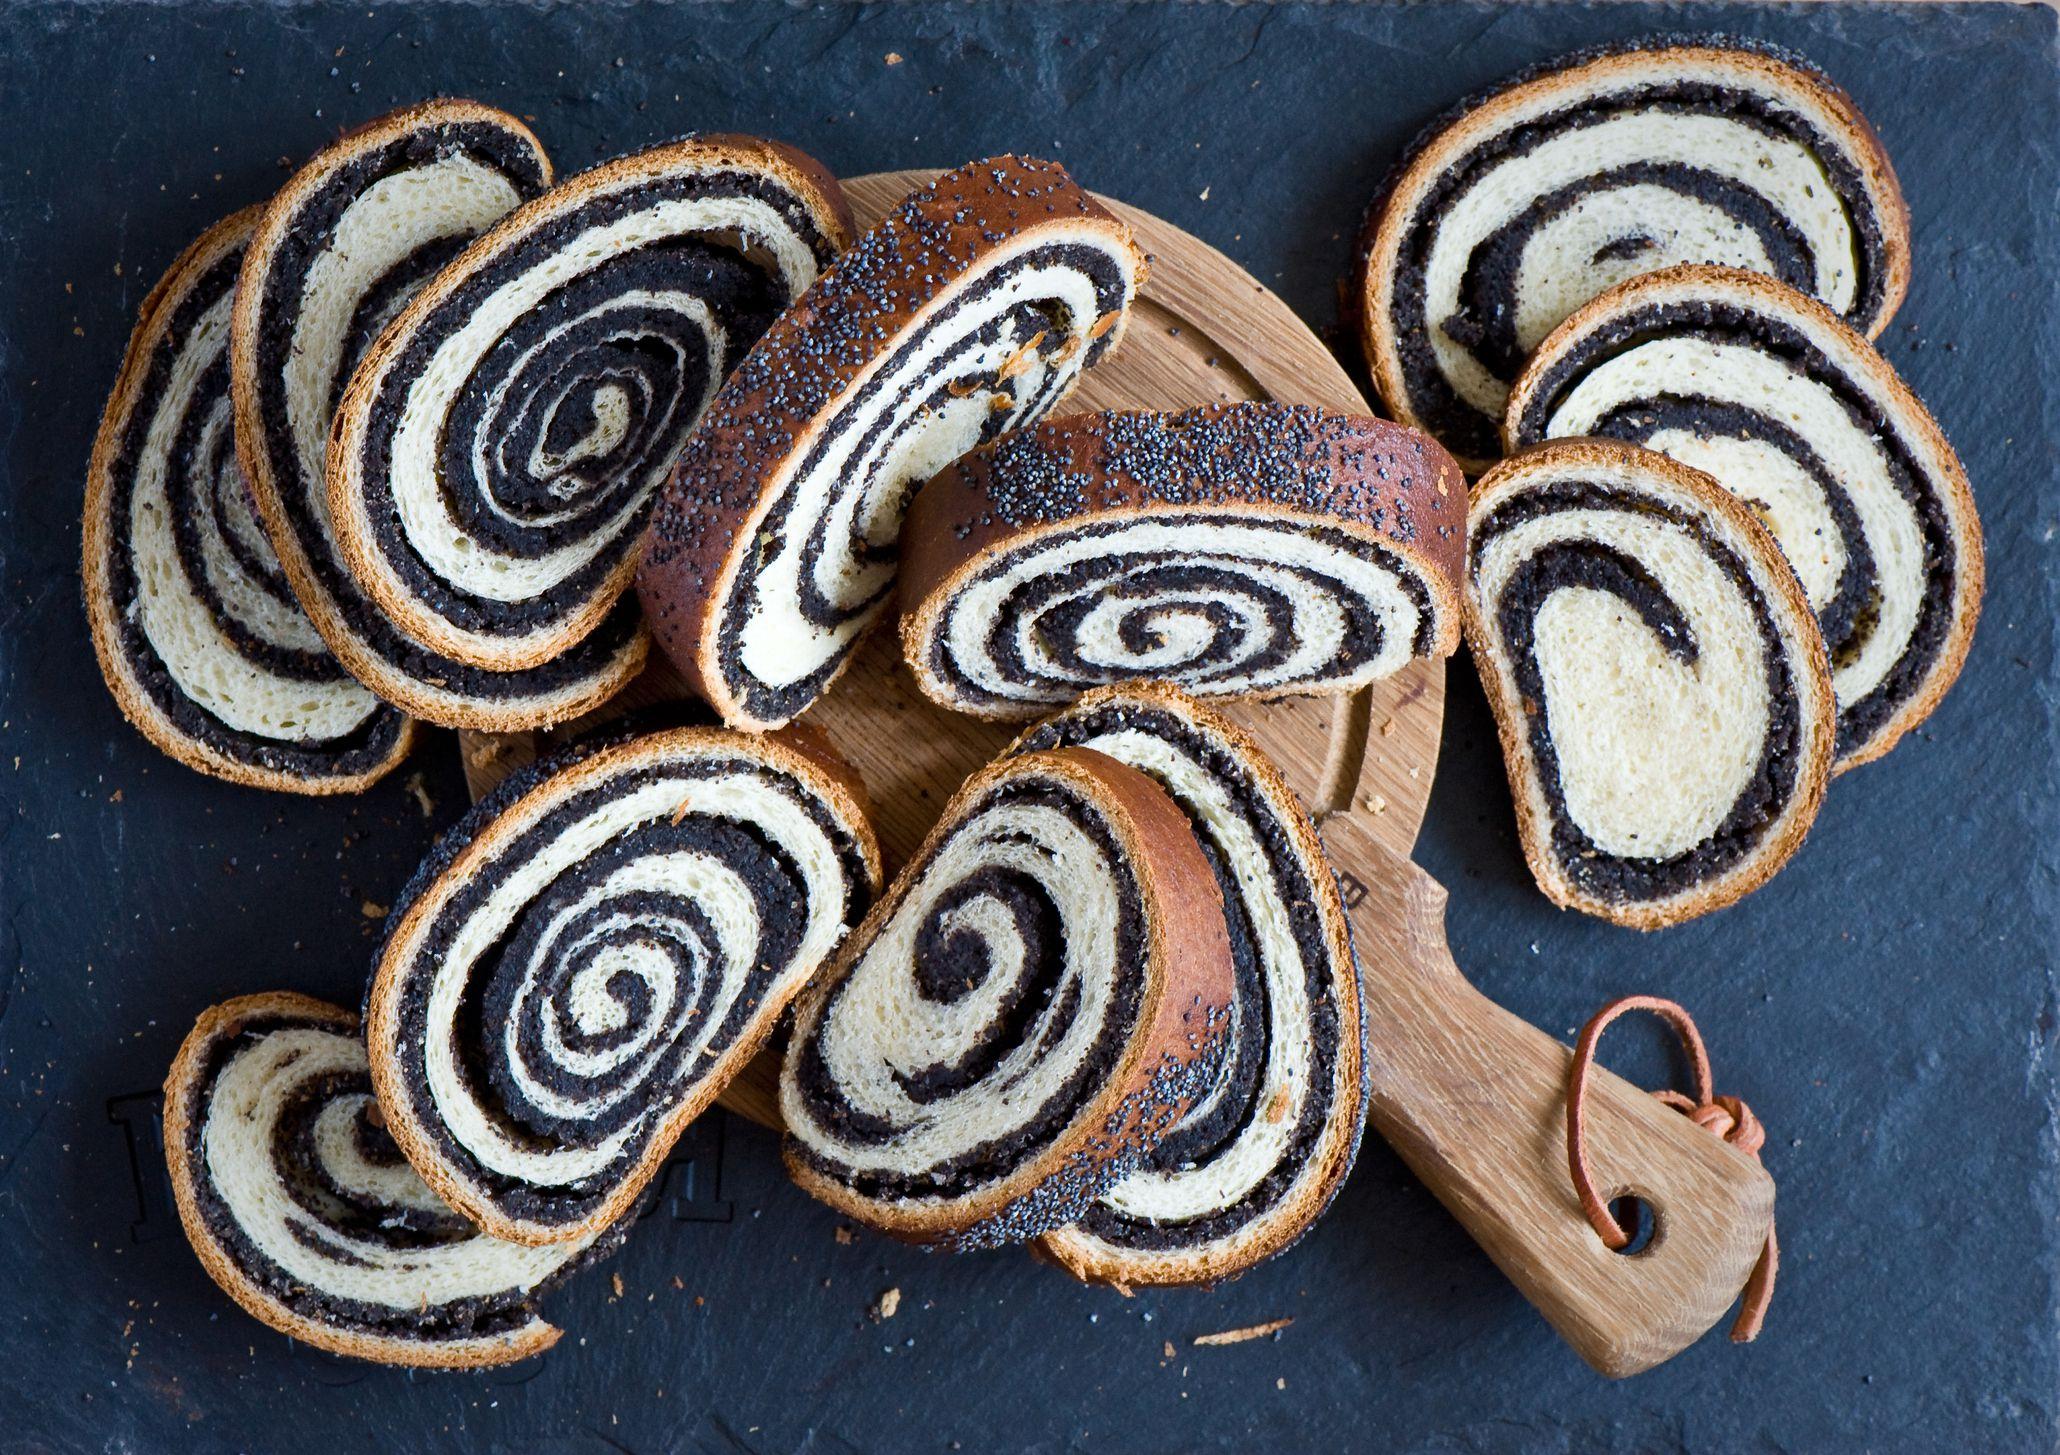 Makowiec- Poppy seed roll